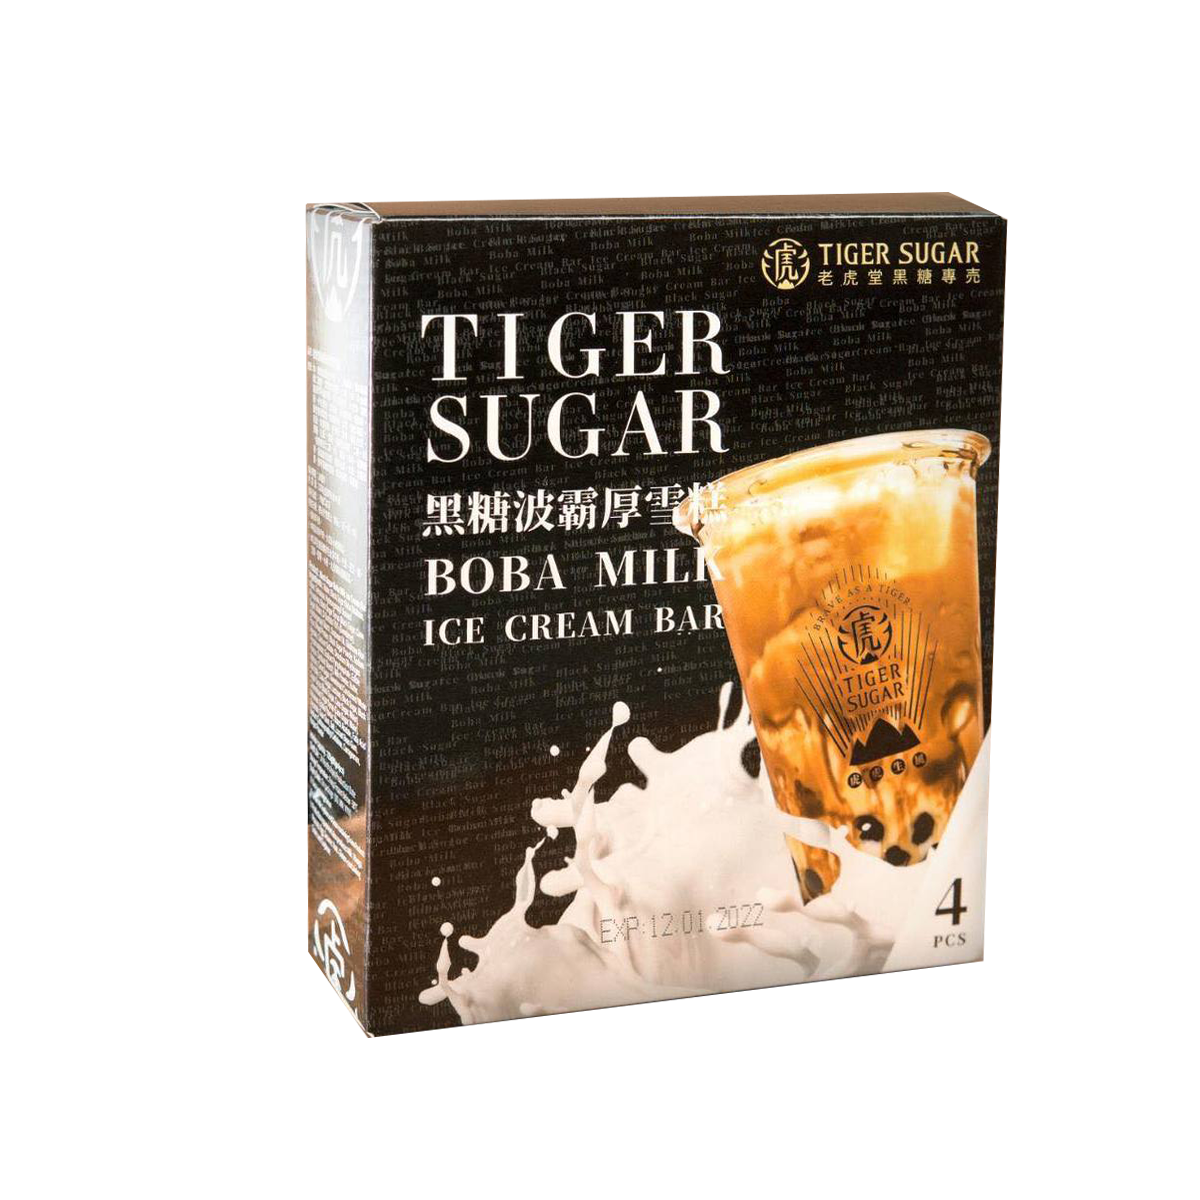 Tiger Sugar Boba Milk Ice Cream Bar by 4